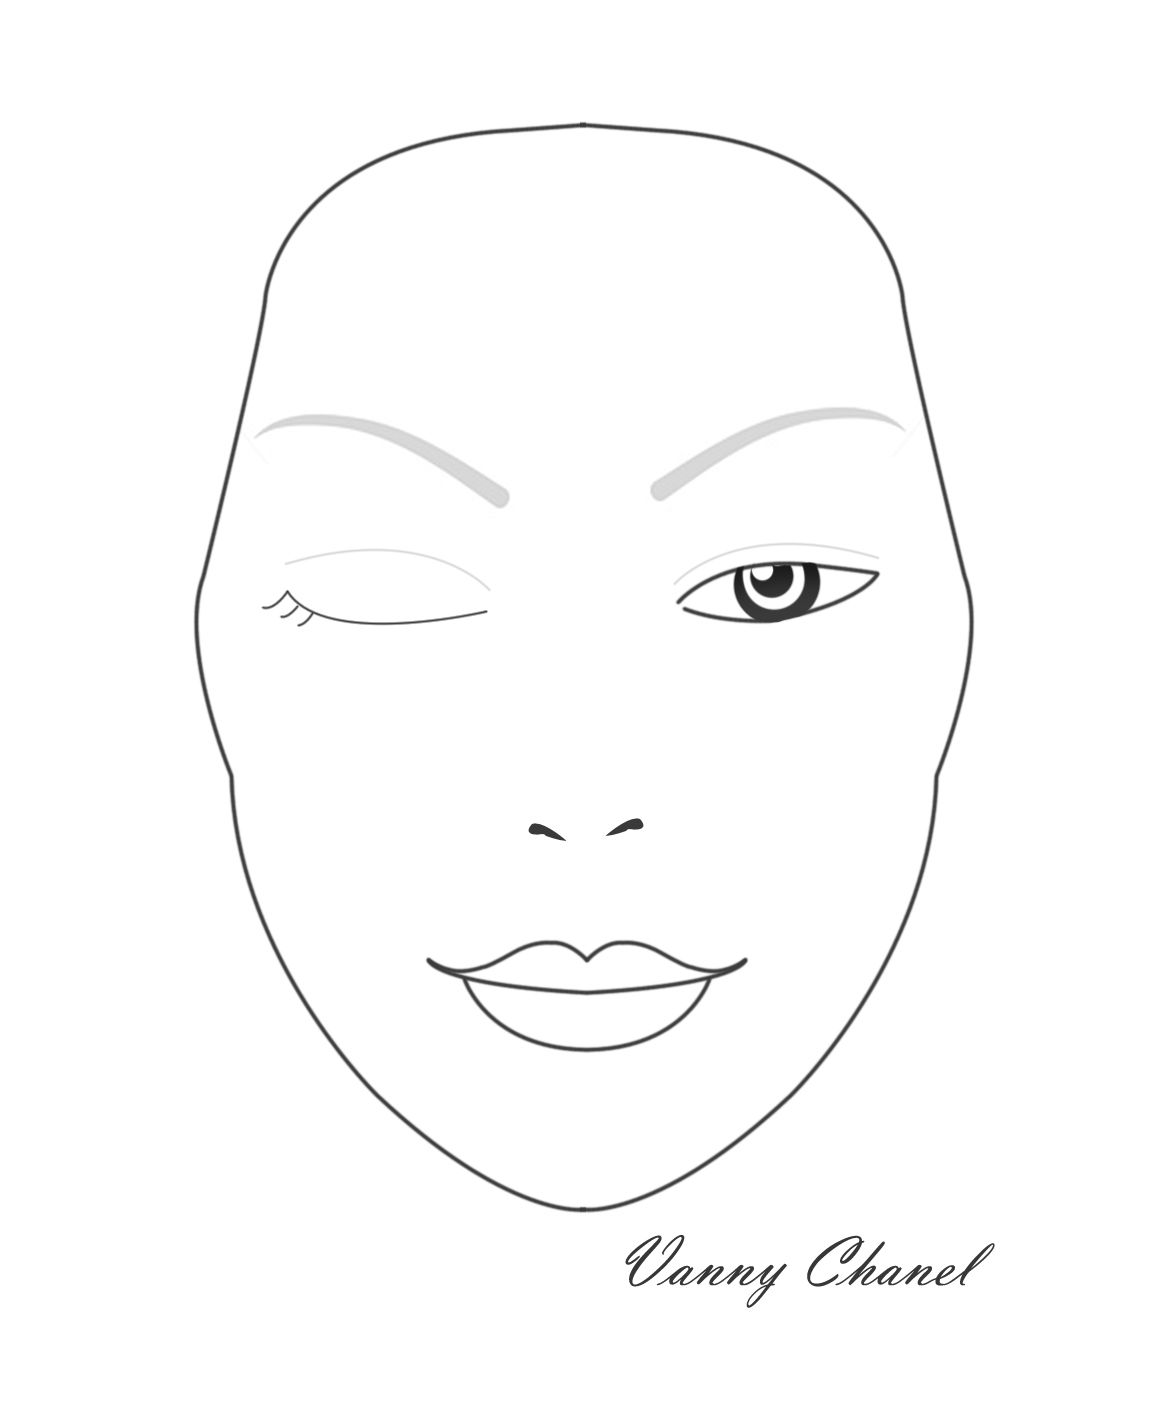 blank face diagram botox asco solenoid valve 8210 wiring mac chart ajilbab com portal